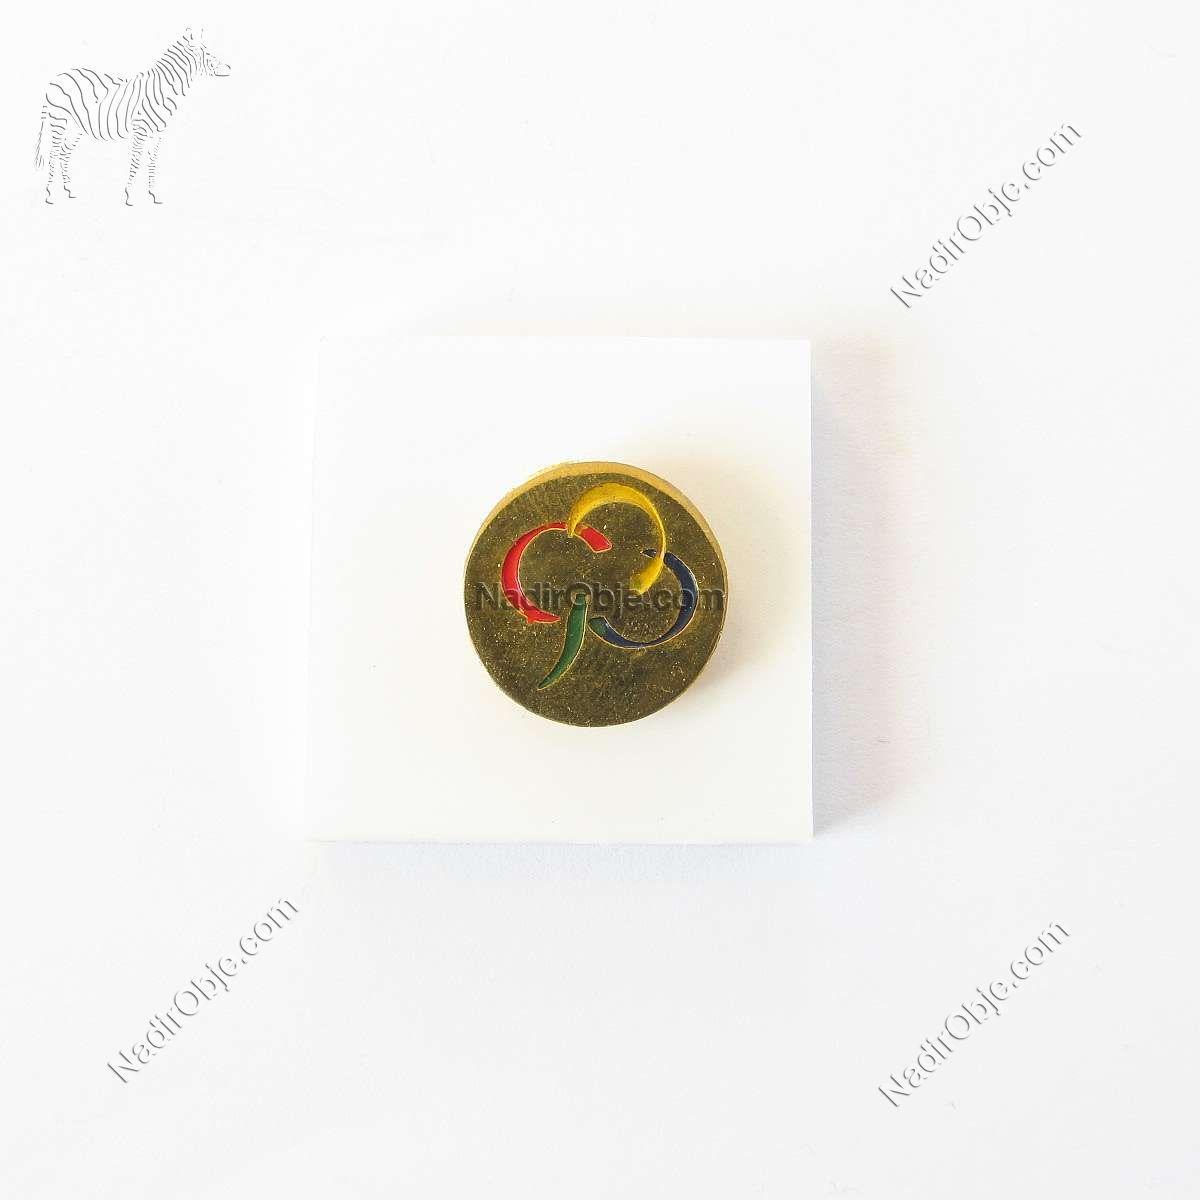 4 Renkli Rozet Metal Objeler Lapel Badge